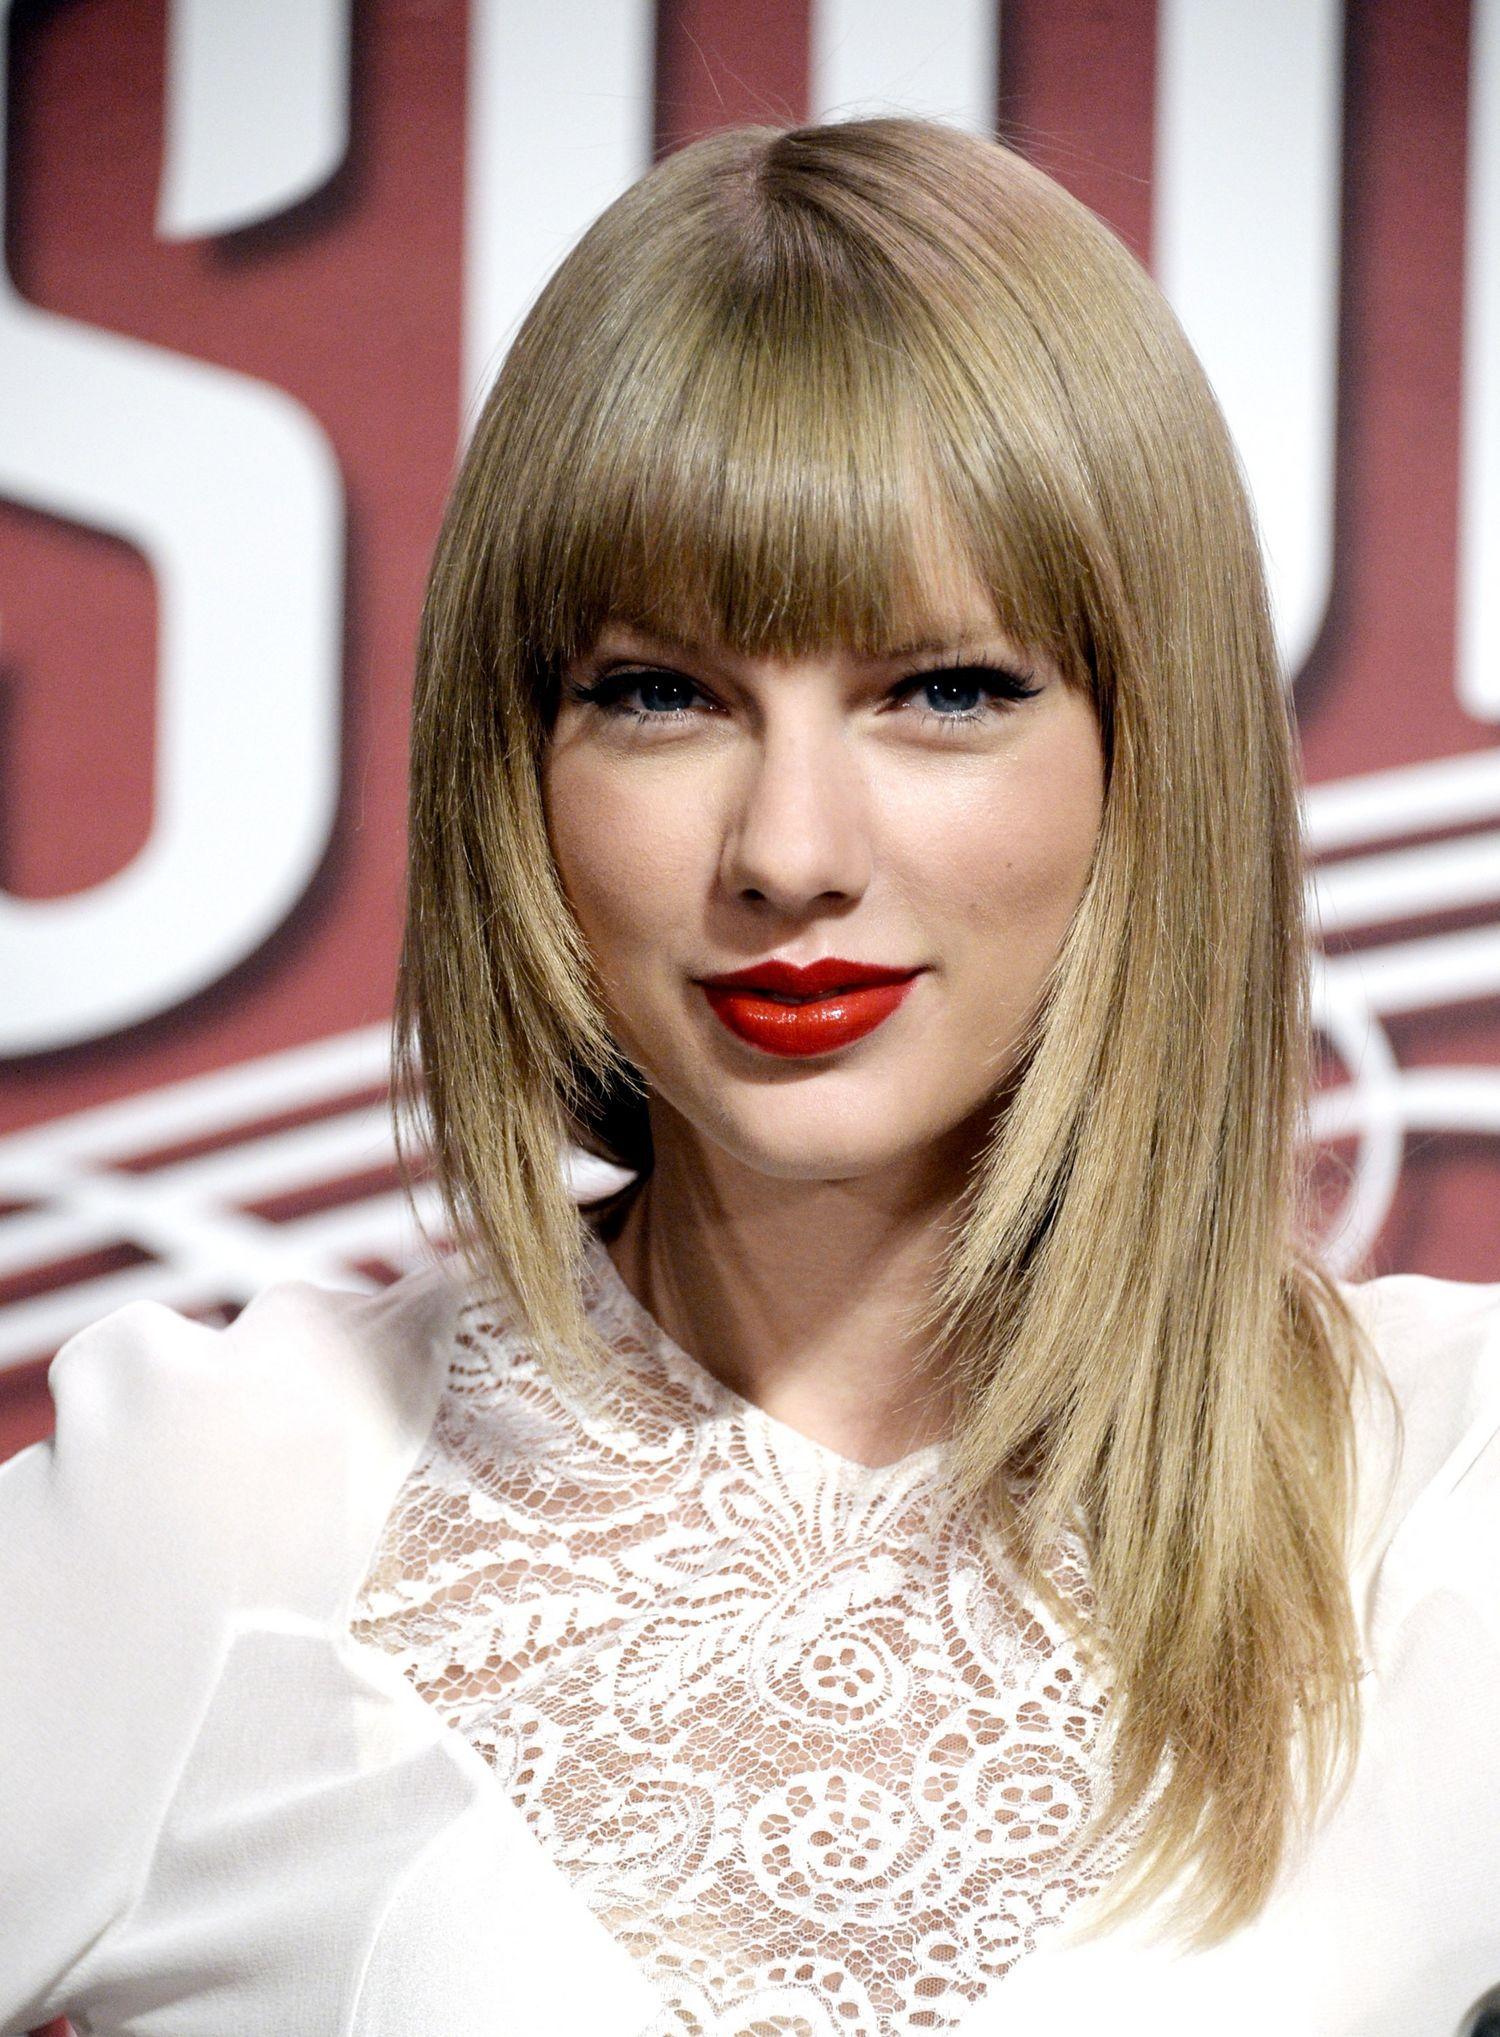 2014 Taylor Swift Long Hairstyles Long Hair For Short Bangs Pretty Designs Taylor Swift Hair Long Hair Styles Taylor Swift Bangs